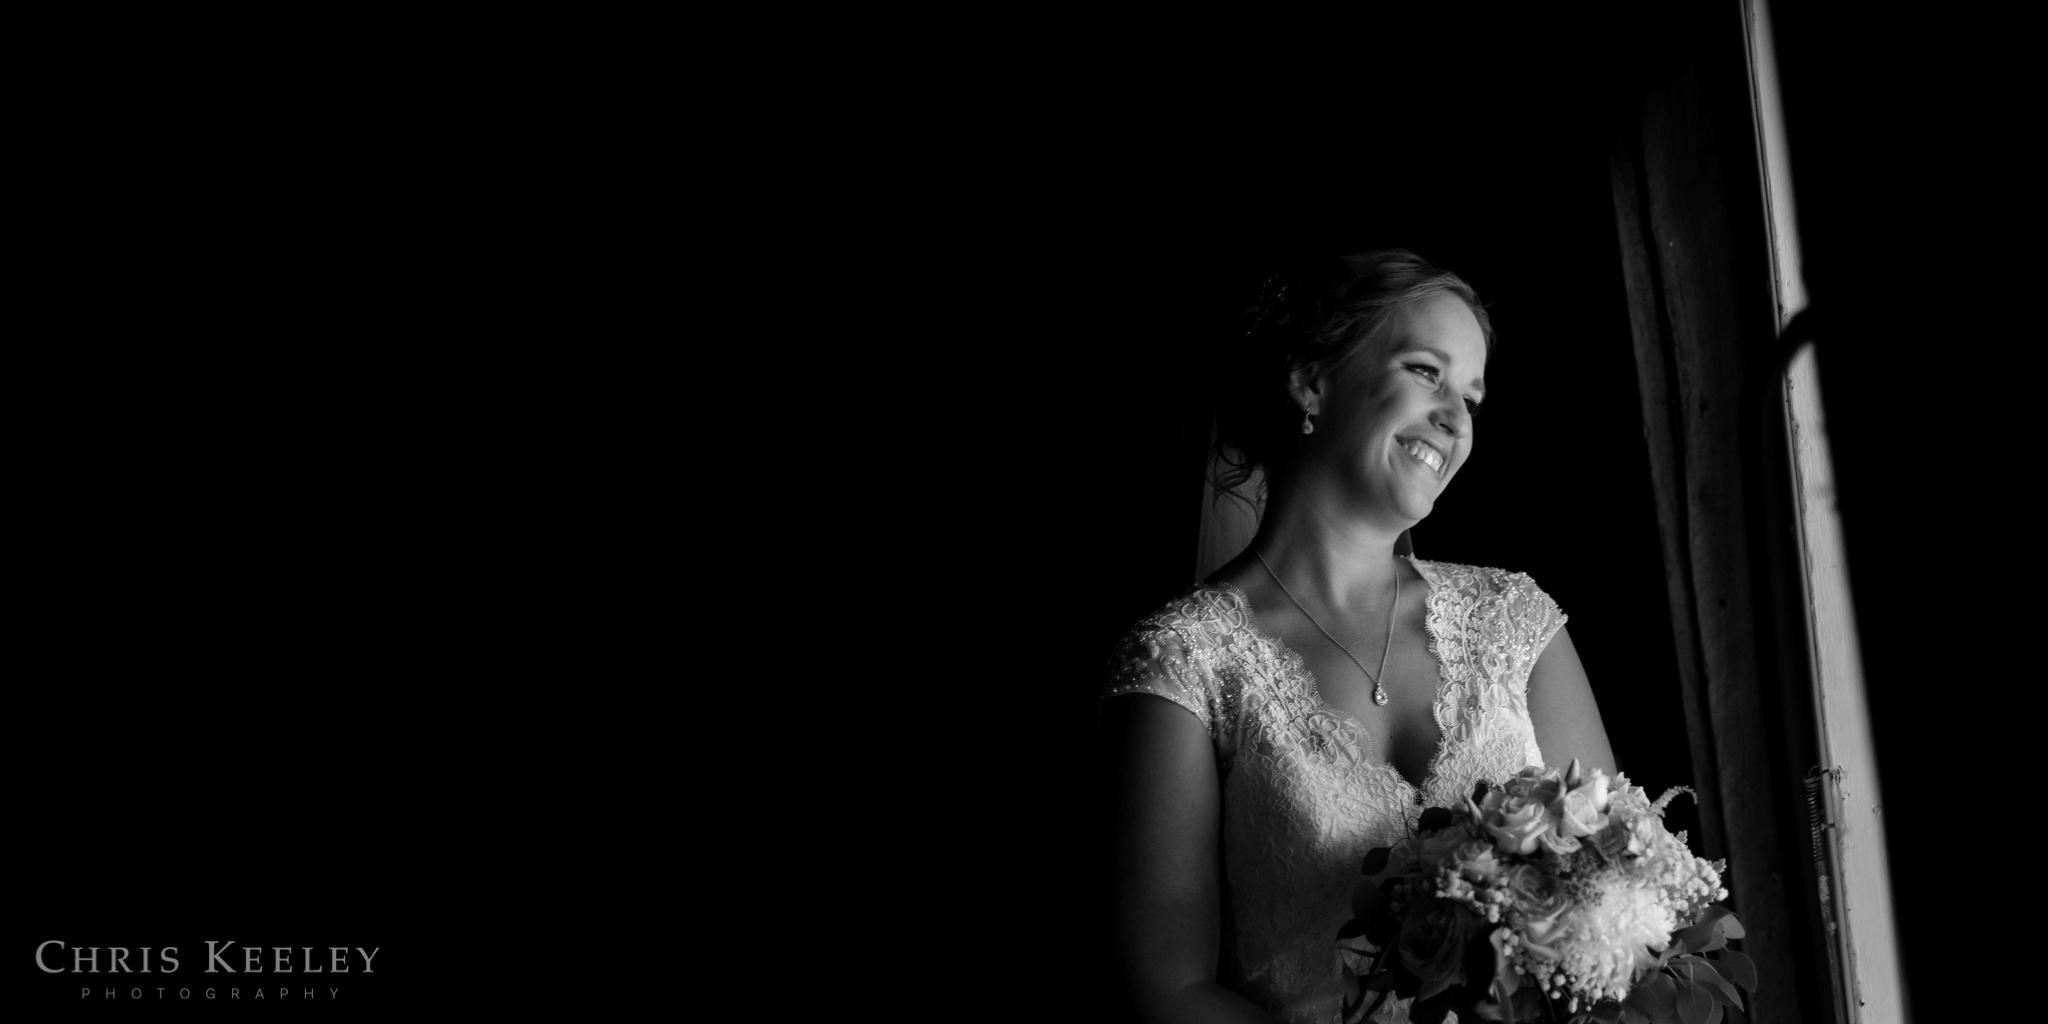 chris-keeley-photography-new-hampshire-wedding-photographer-11.jpg